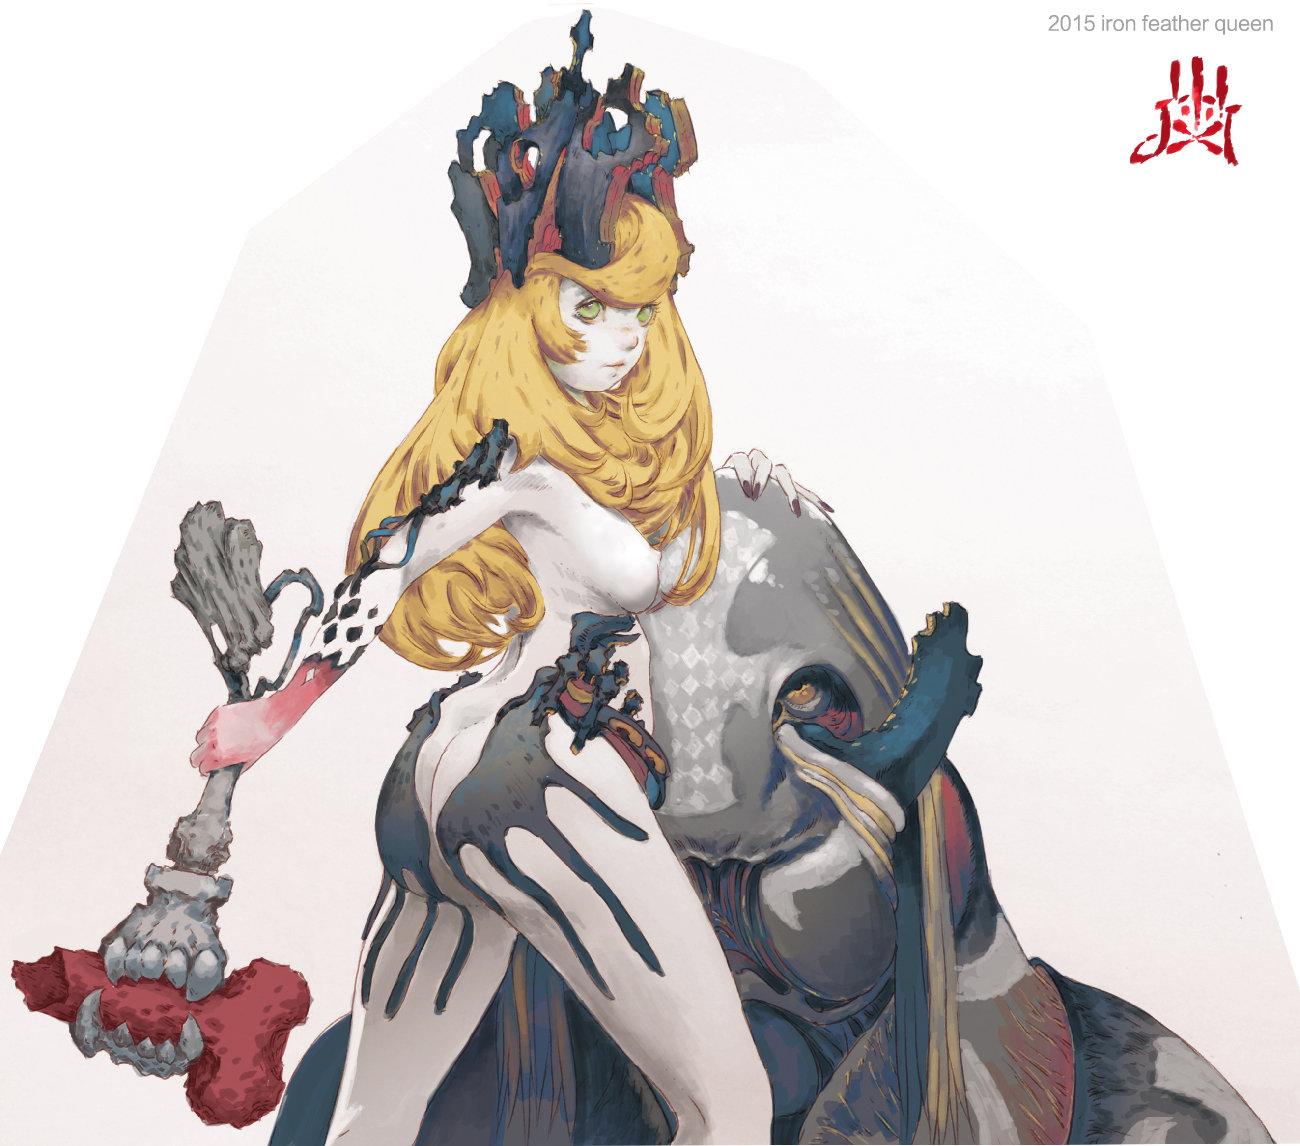 iron feather queen ELSA